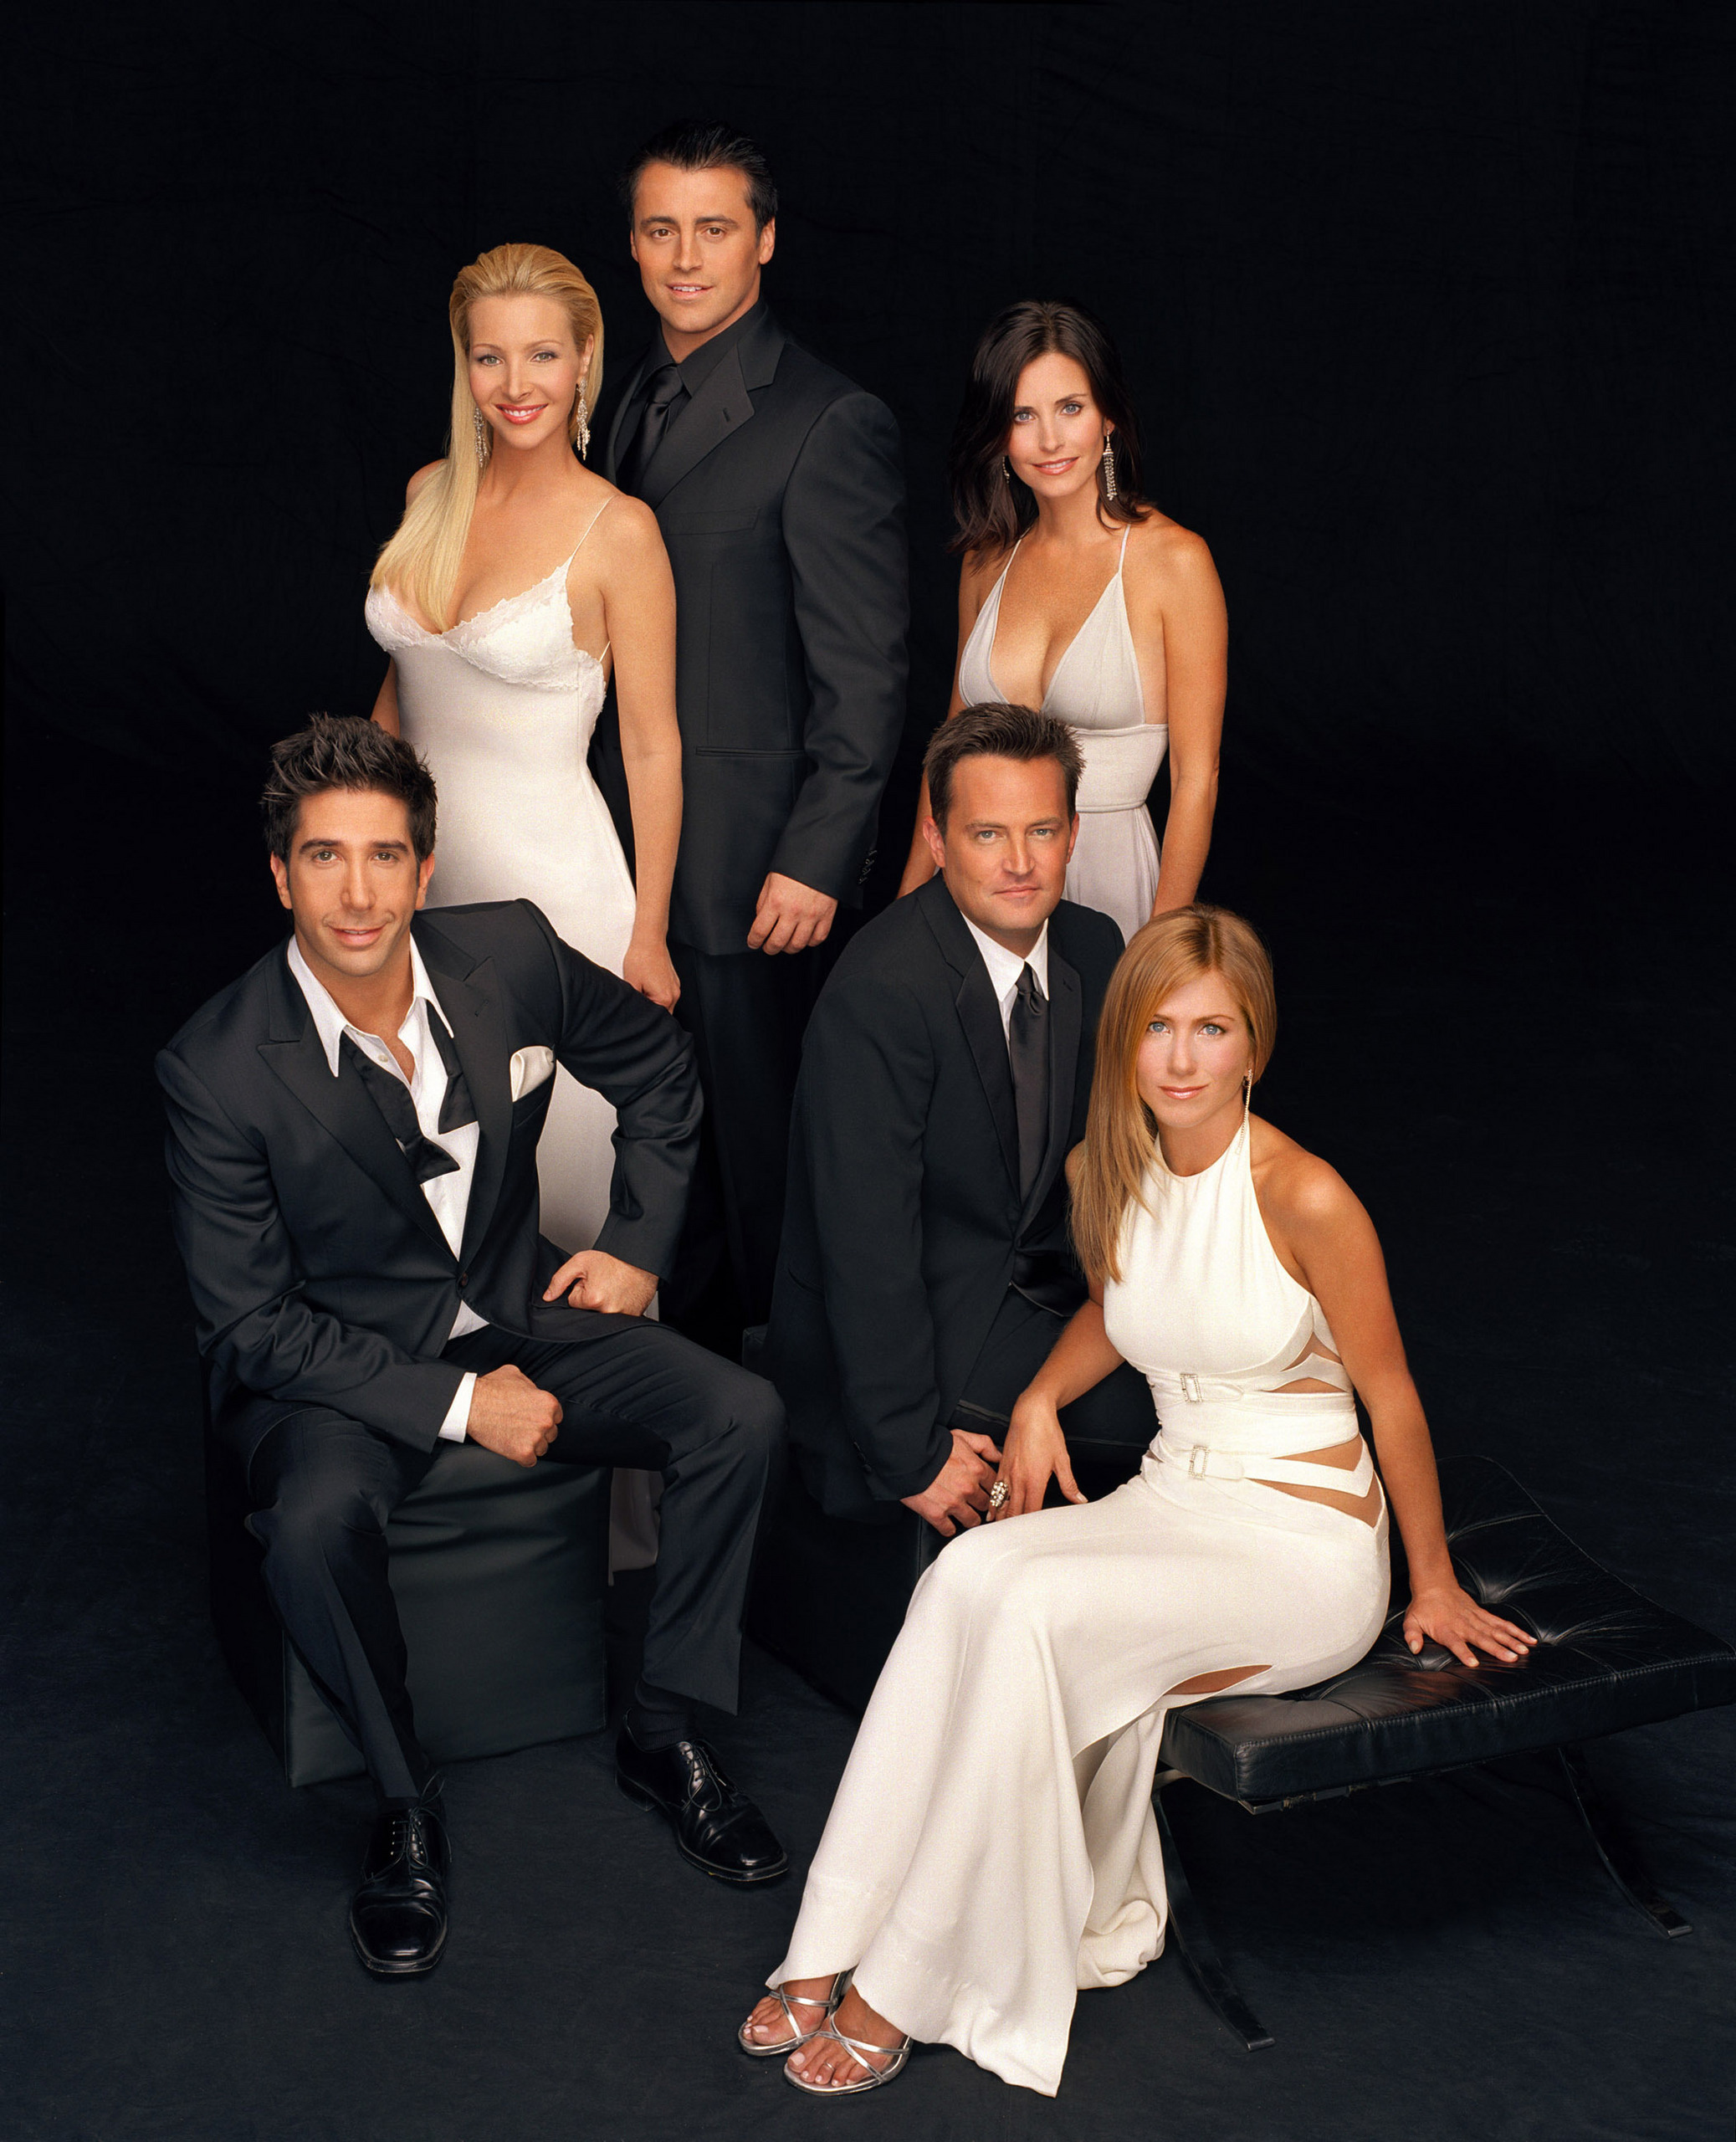 دانلود زیرنویس فارسی سریال Friends